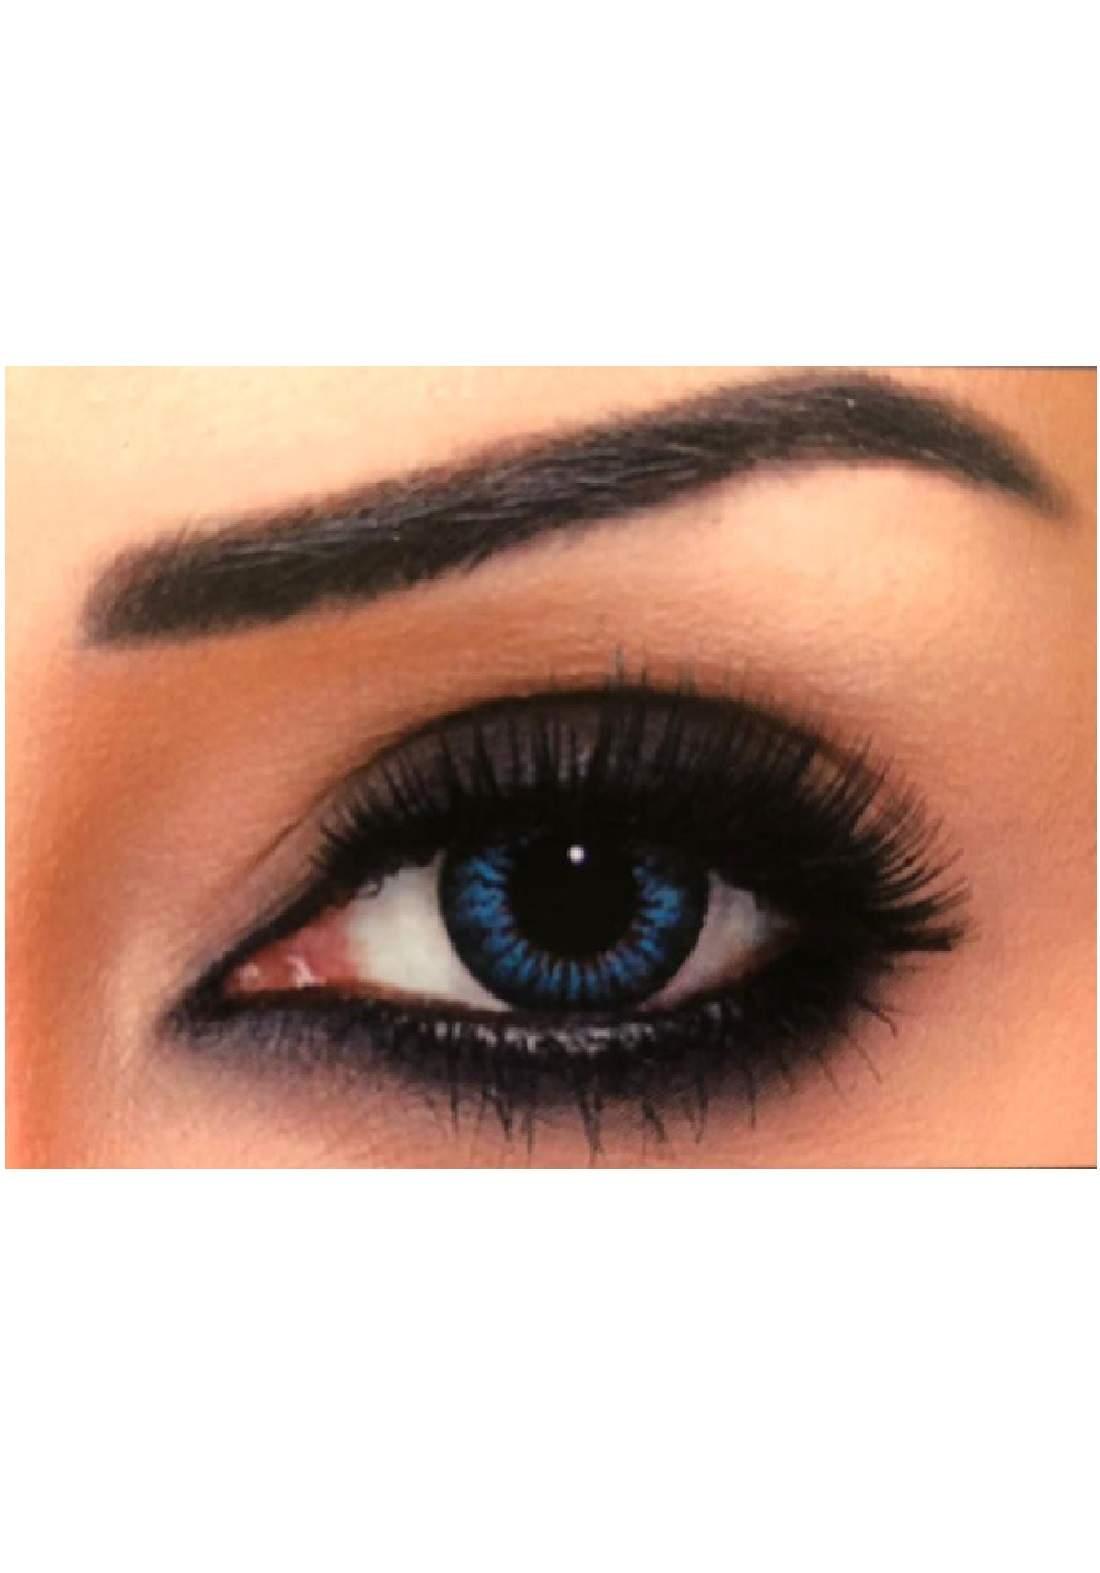 Bella Classic 301034 Contact Lenses 3 Months Use Snow White - Blue  No.35 عدسات لاصقة